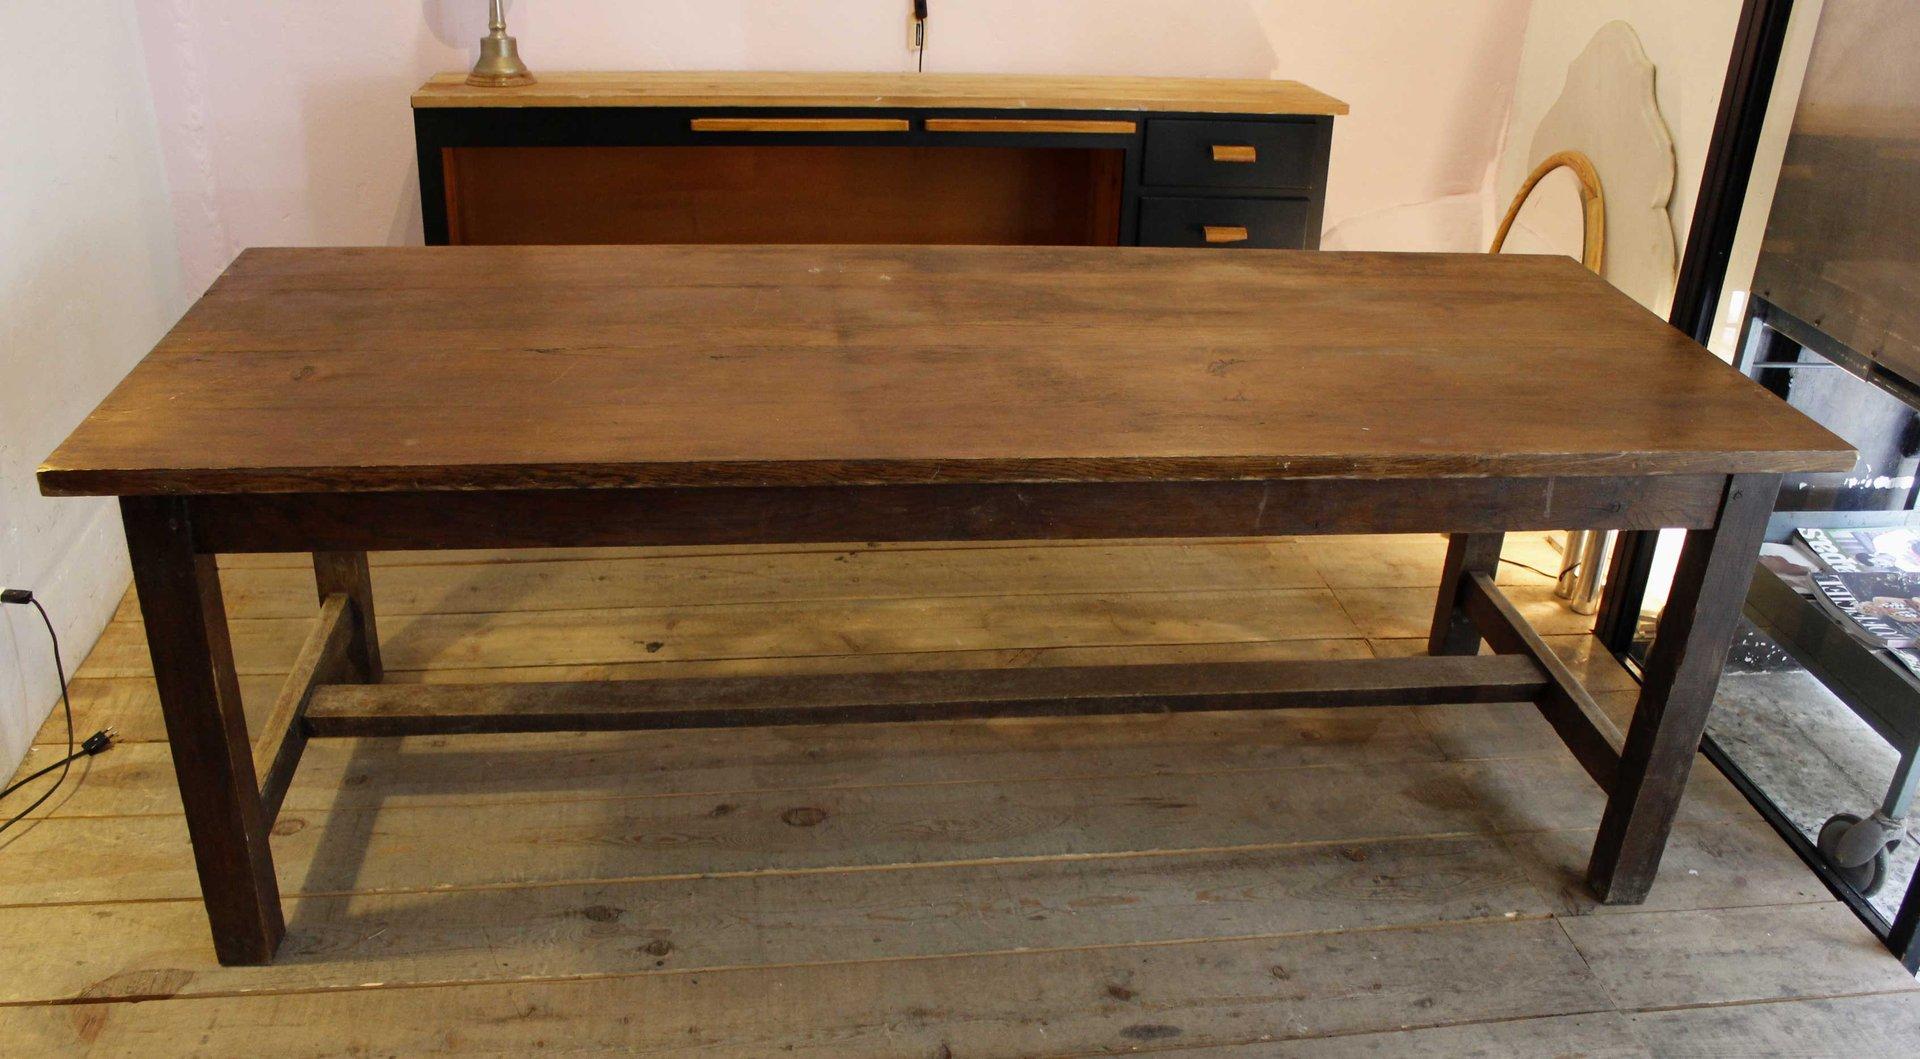 Vintage Oak Farmhouse Dining Table for sale at Pamono : vintage oak farmhouse dining table 1 from www.pamono.co.uk size 1920 x 1058 jpeg 181kB